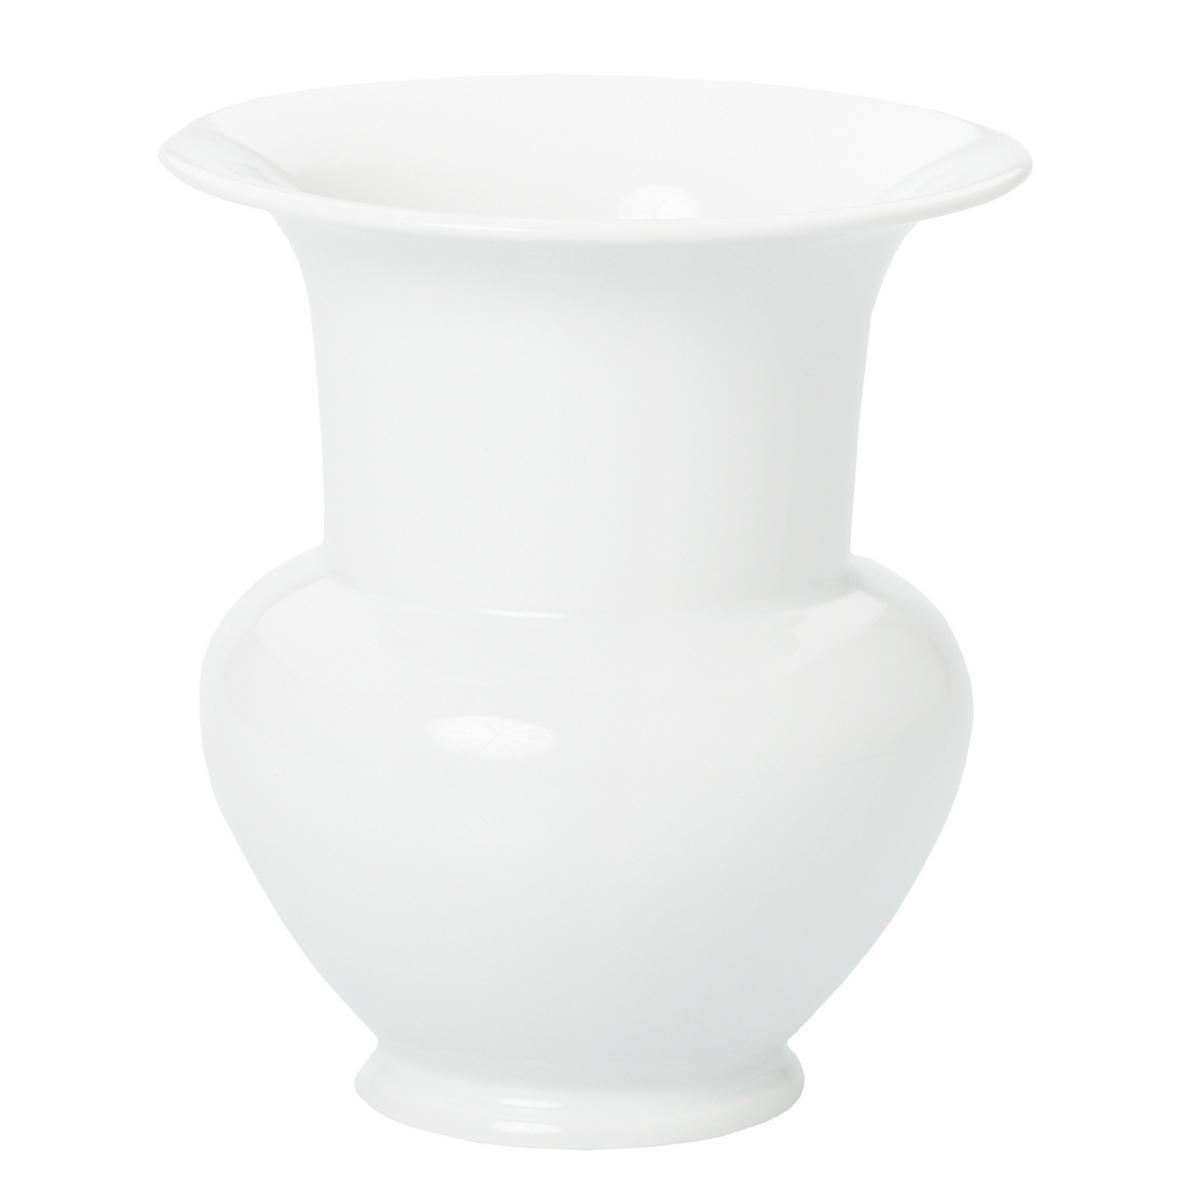 Kpm Vase Fidibus Groß Weiß Artedona Com